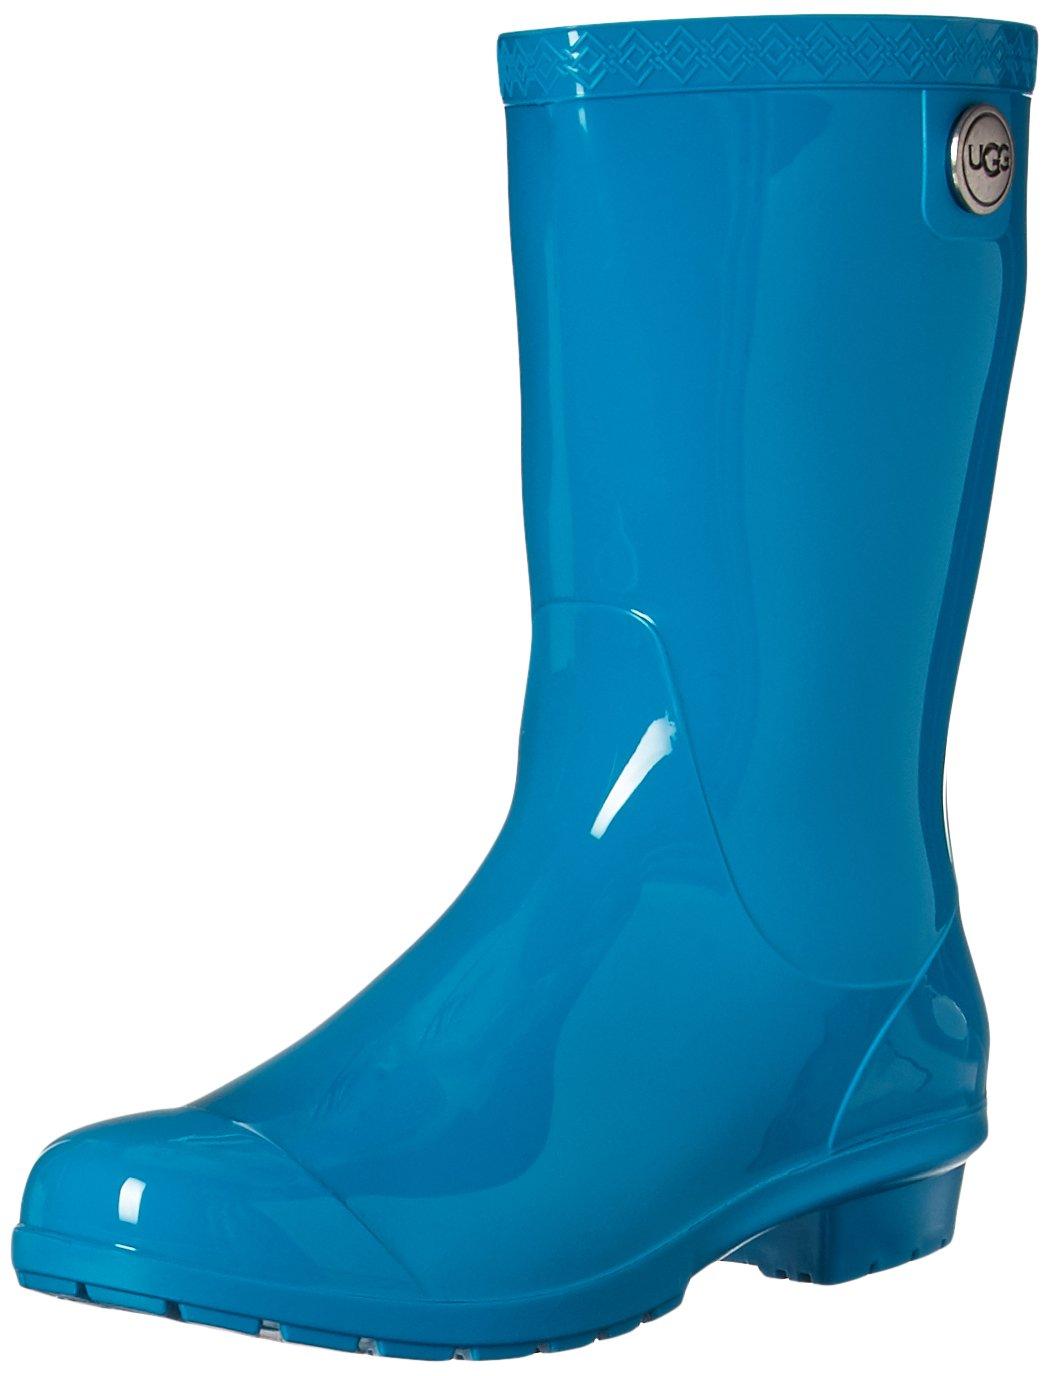 UGG Women's Sienna Rain Boot, Enamel Blue, 9 M US